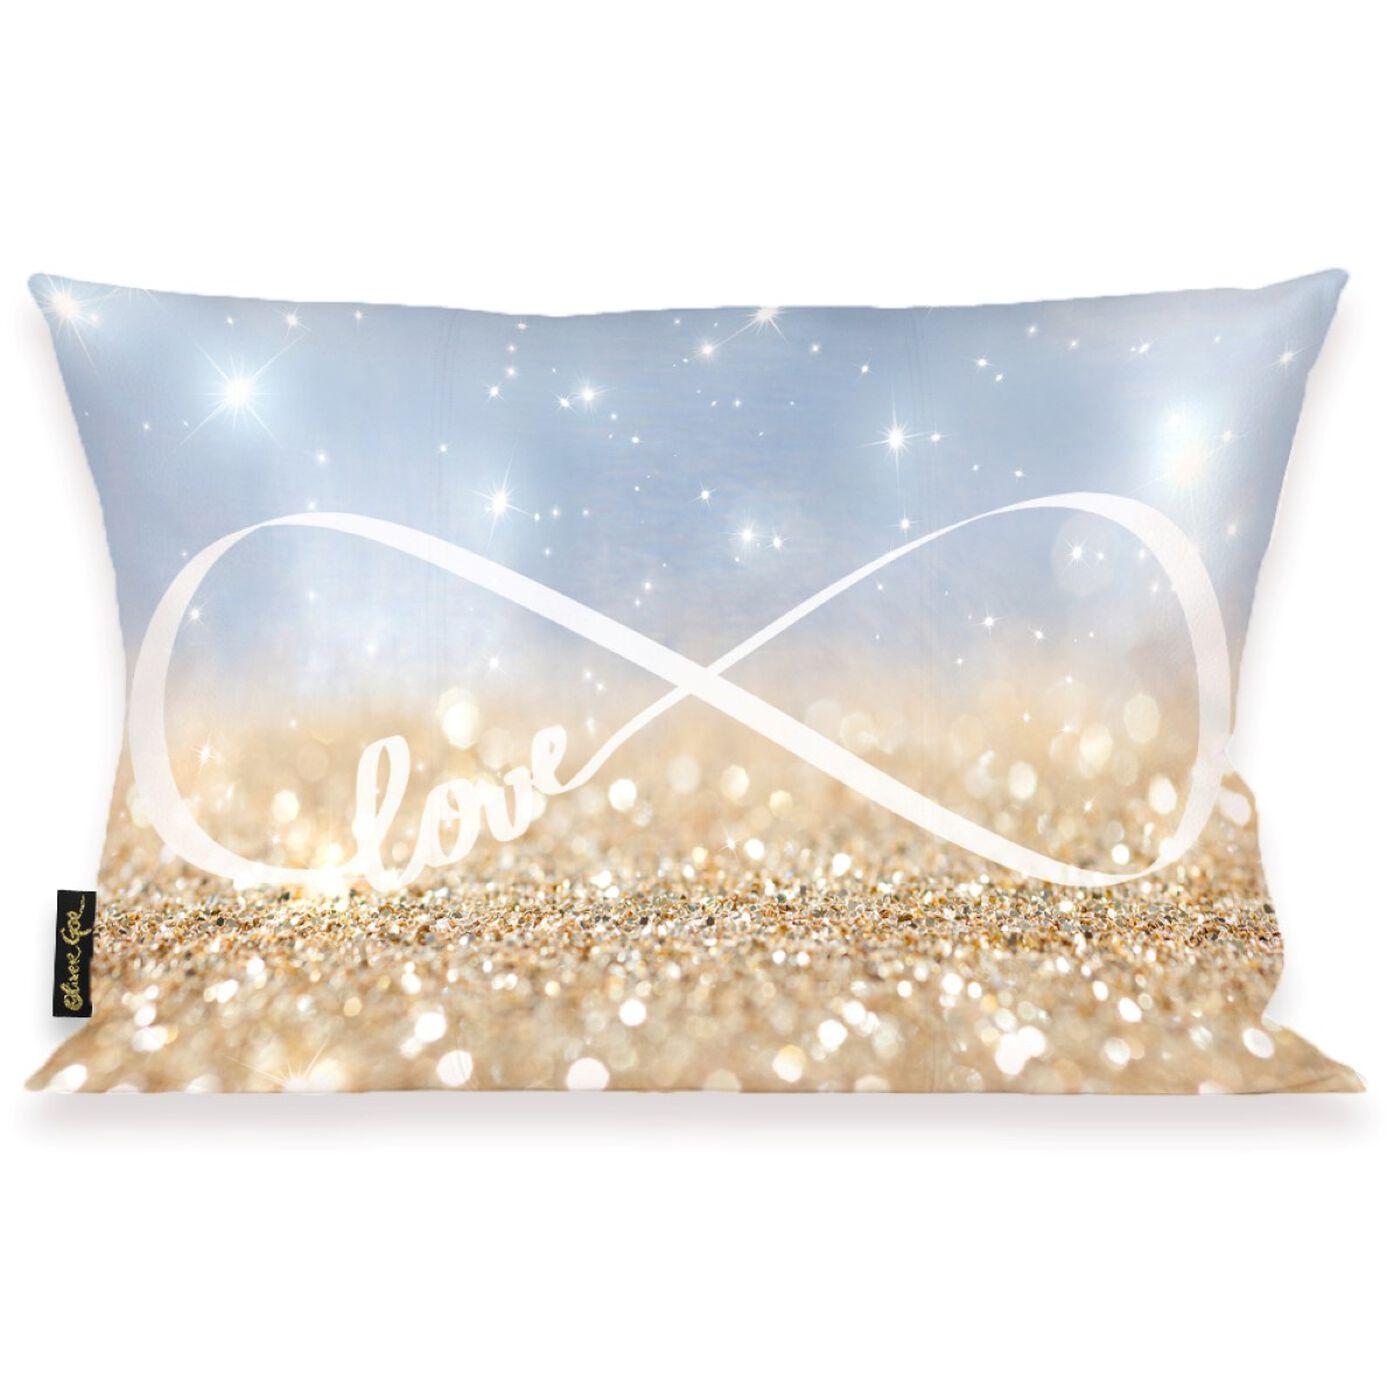 Infinite Love Sign Pillow